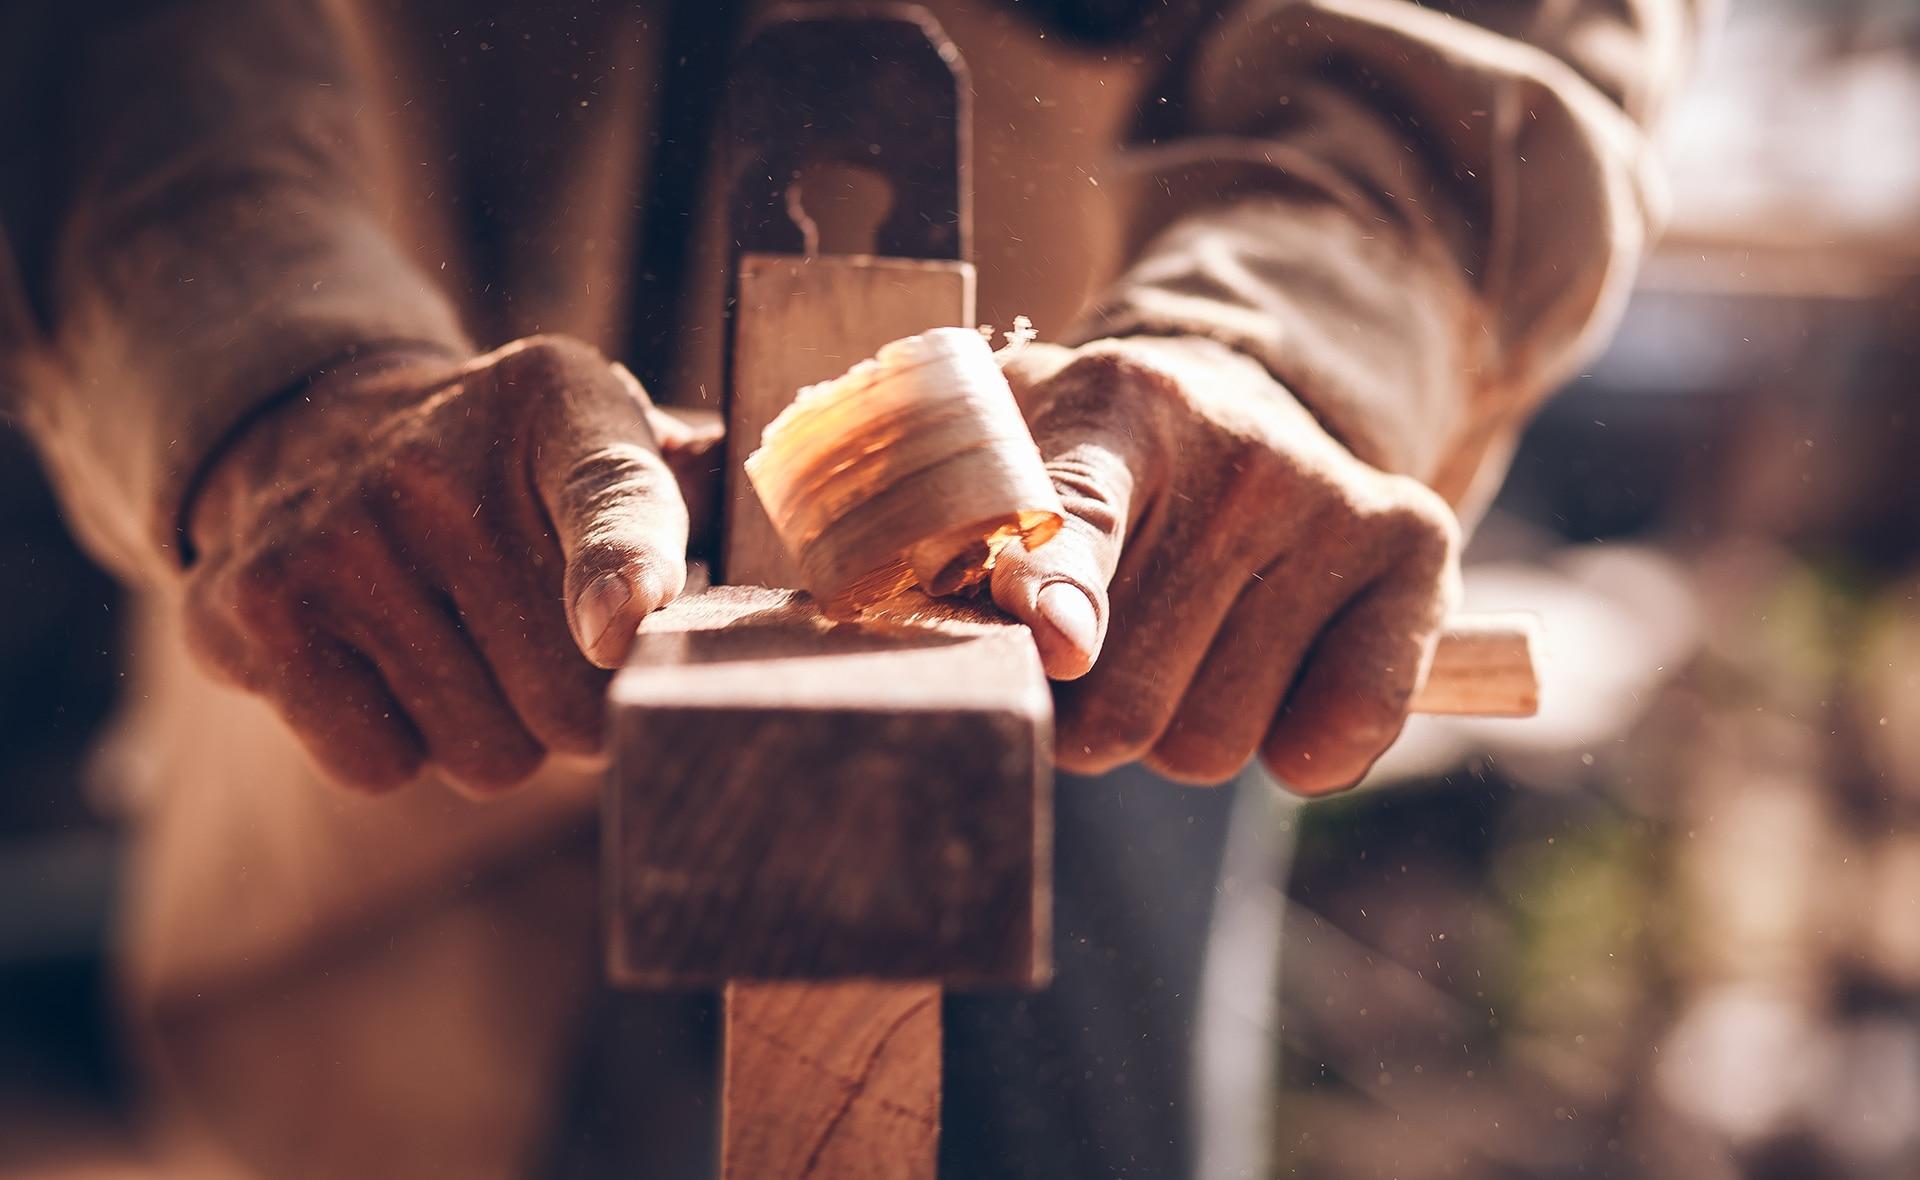 BBVA-podcast-agile-LEAN-procesos-agile-trabajo-mudo-madera-pulir-lectura-educacion